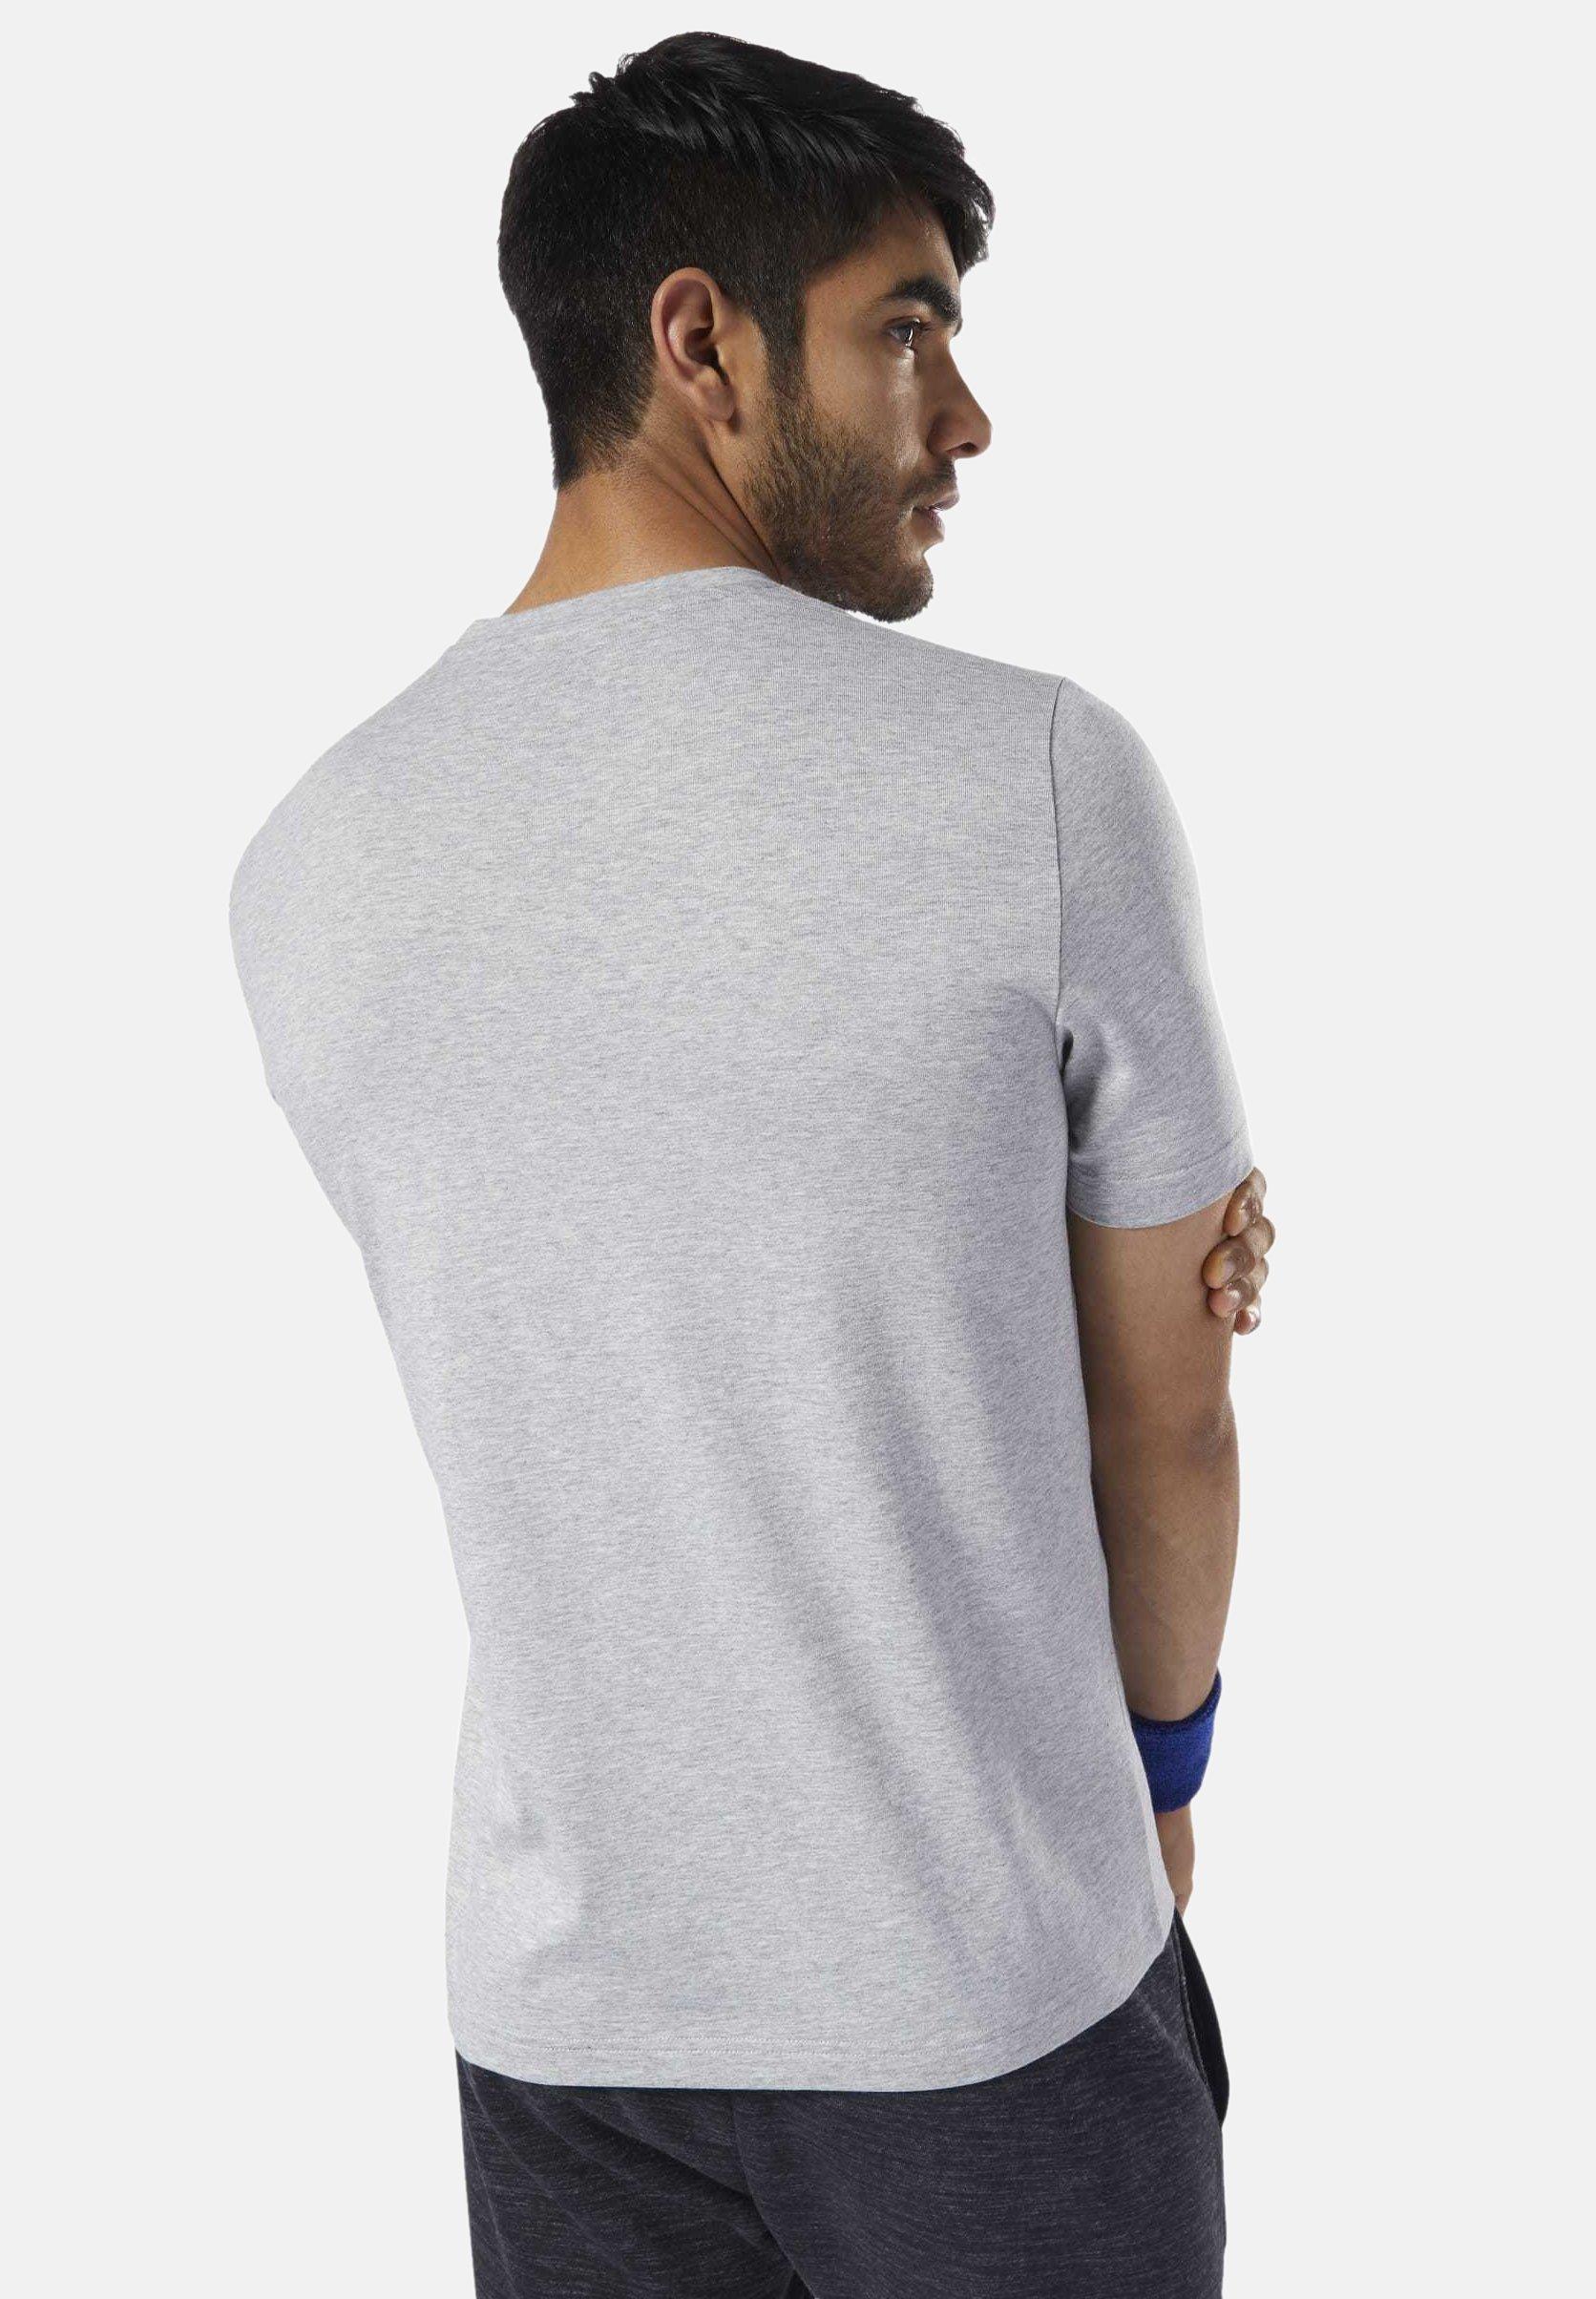 Retro Winter Reebok shirt Grey Speedwick Con Stampa TeeT 5A3qSLcj4R